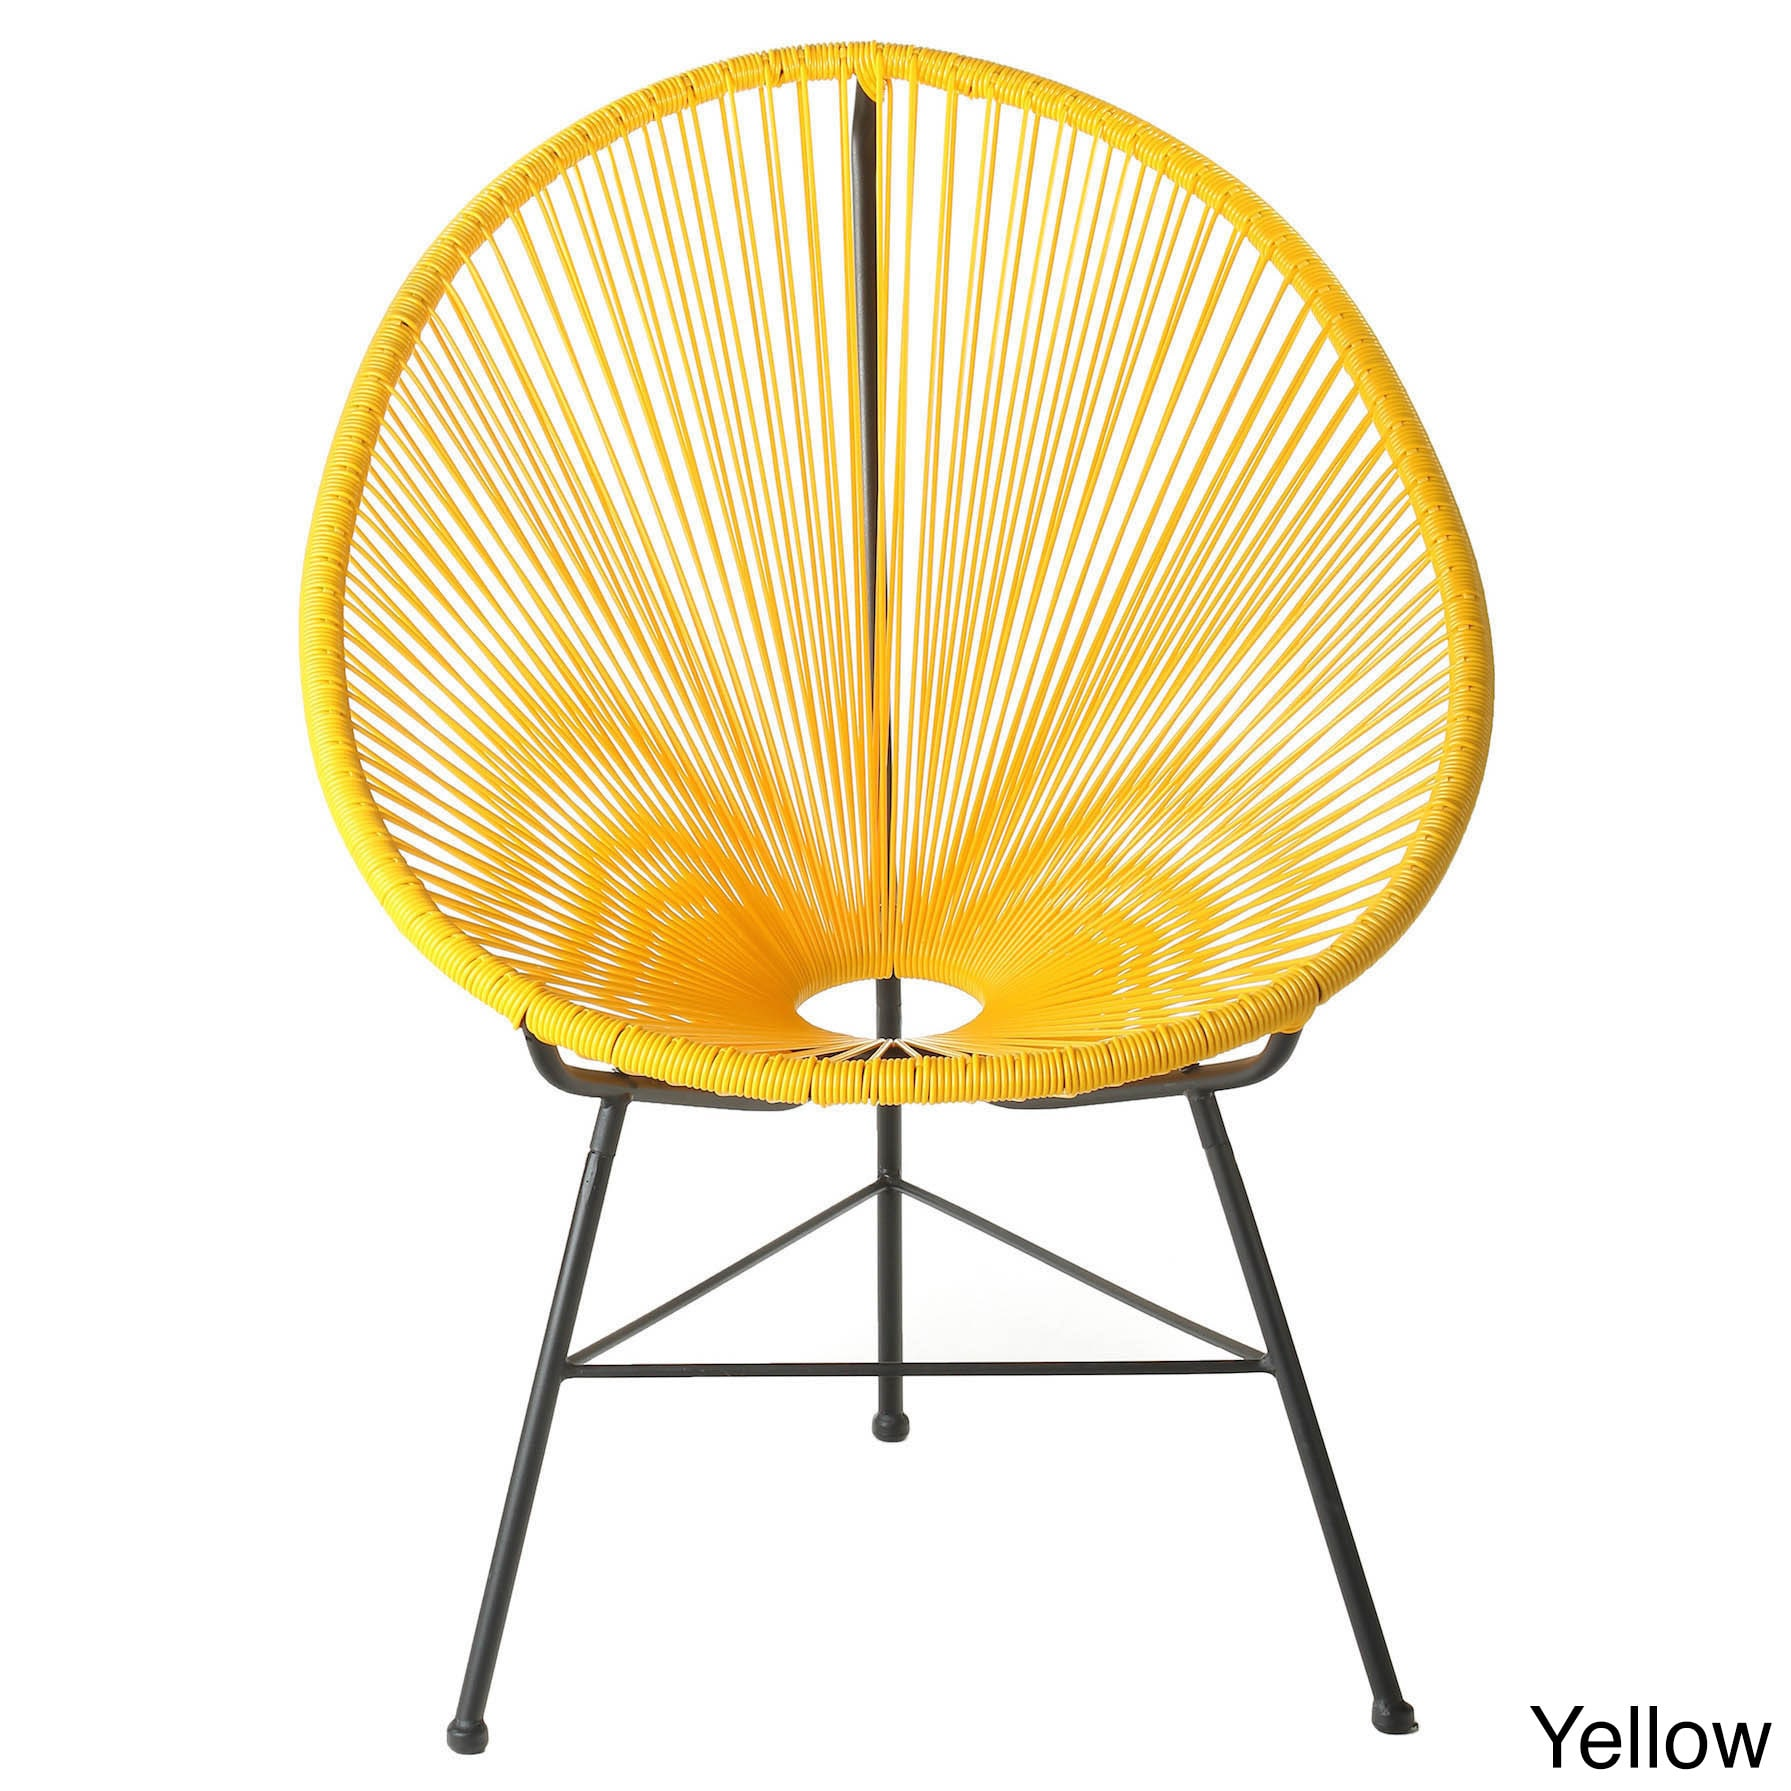 Swell Handmade Acapulco Woven Lounge Chair Camellatalisay Diy Chair Ideas Camellatalisaycom